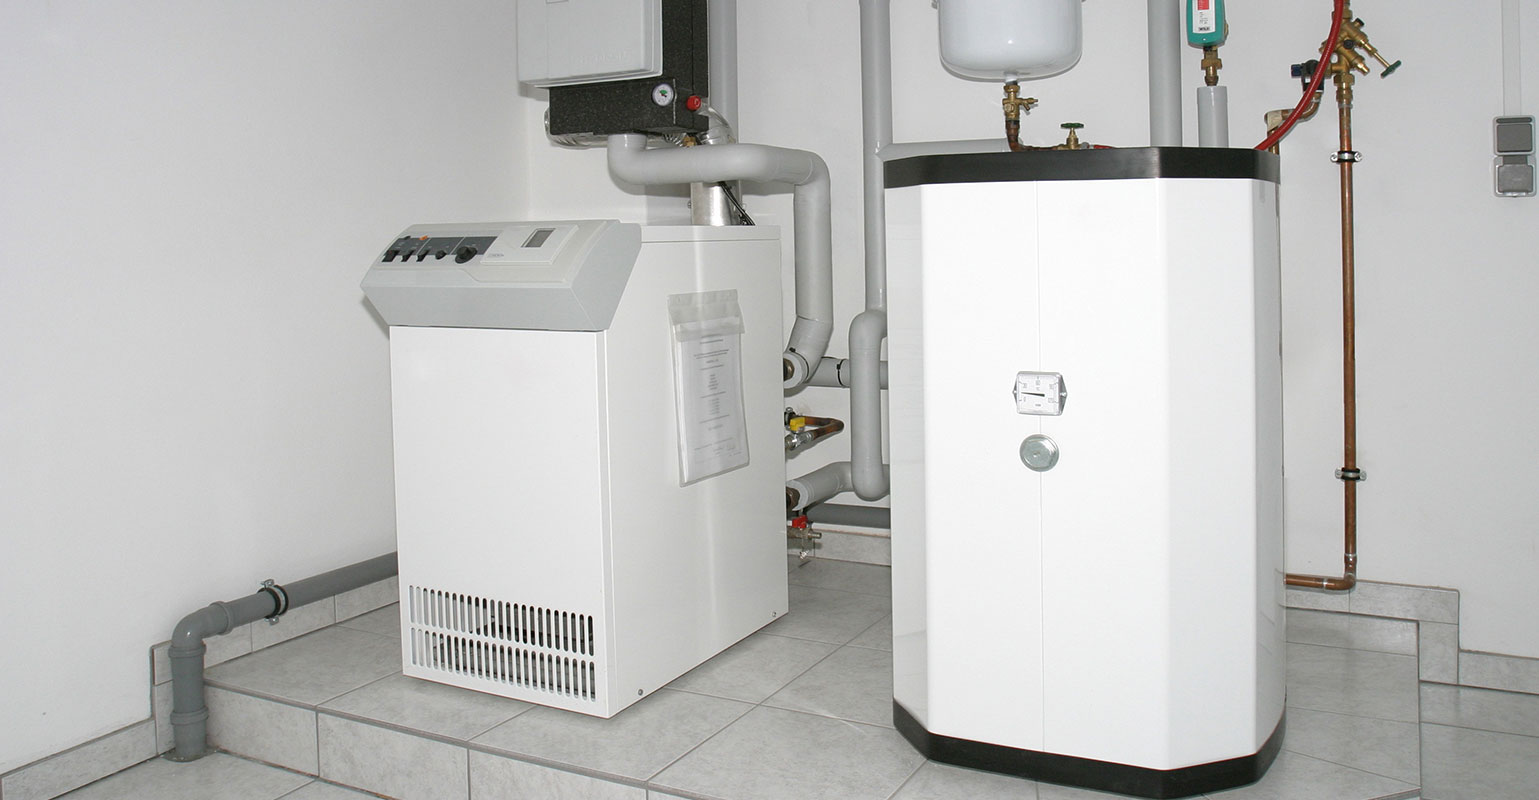 heizung sanit r meisterbetrieb wulferding heizung gas l